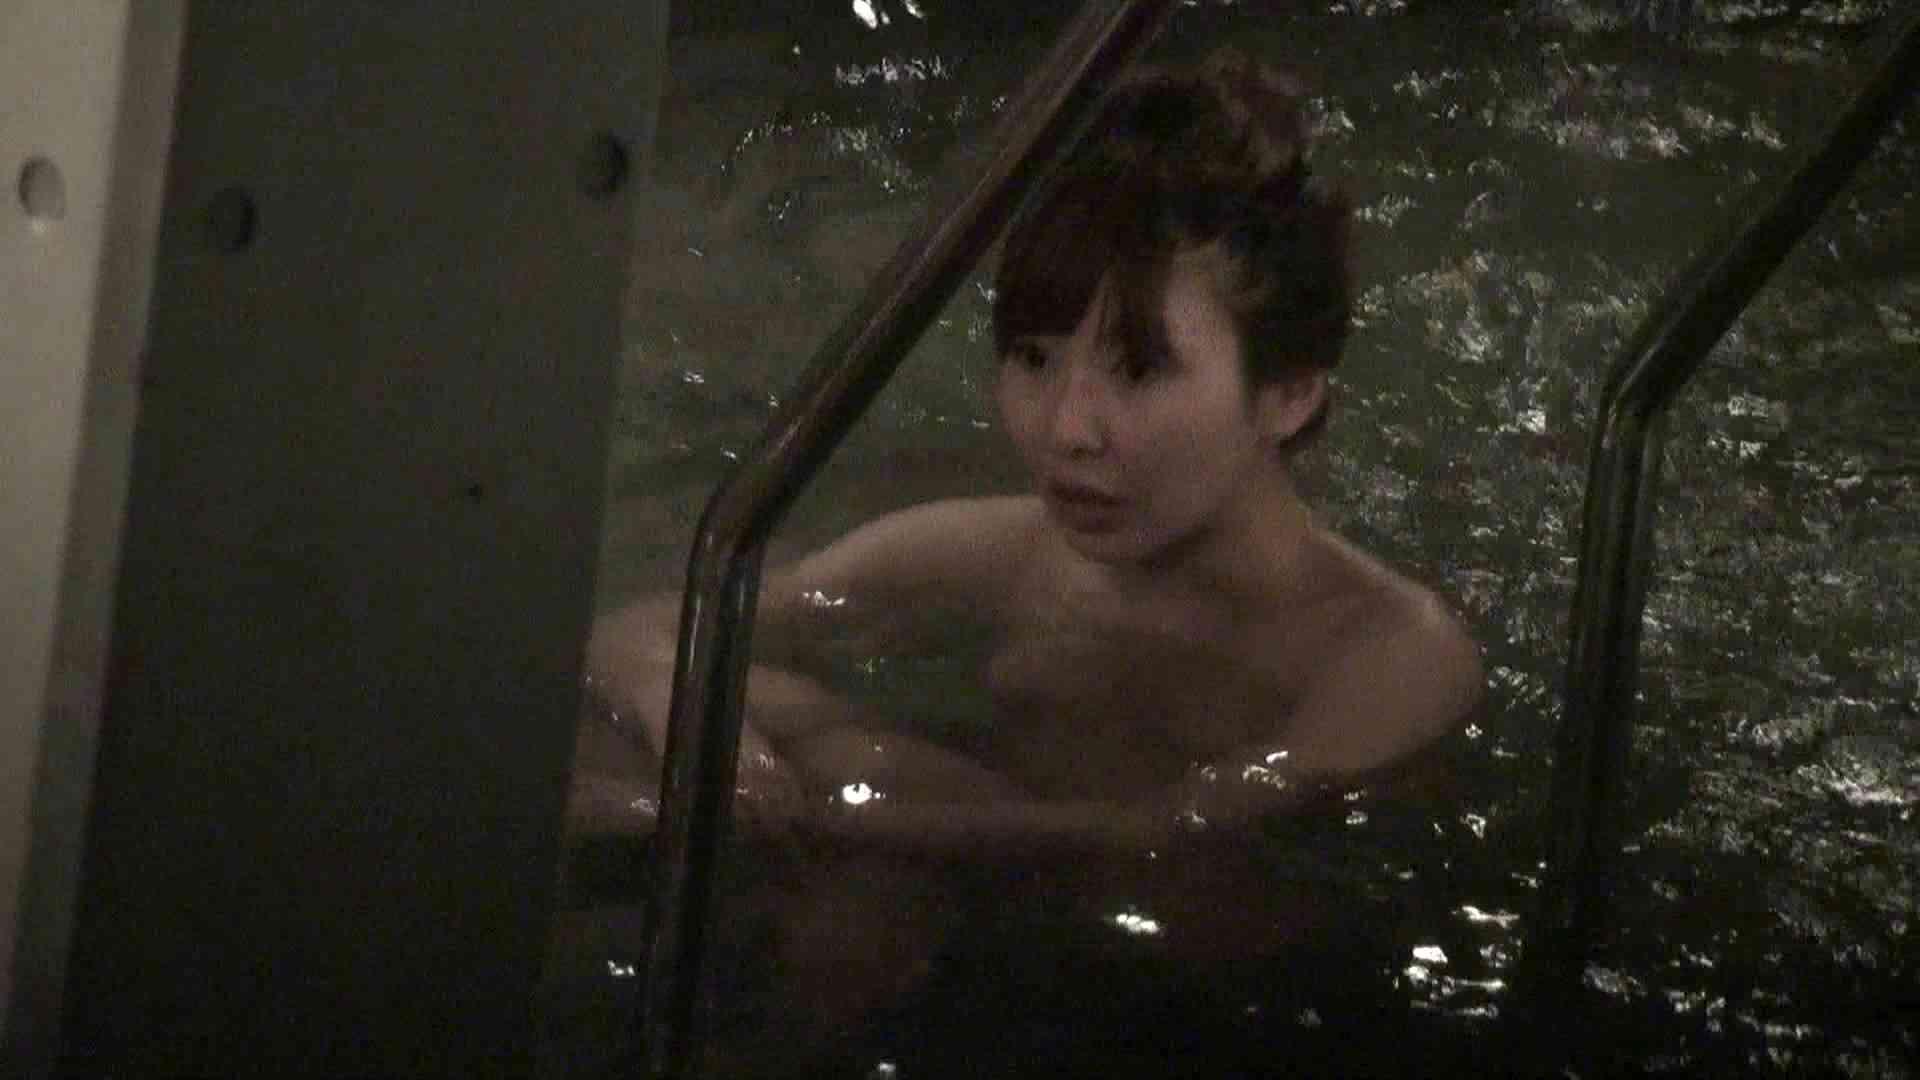 Aquaな露天風呂Vol.410 露天風呂編  94PIX 30